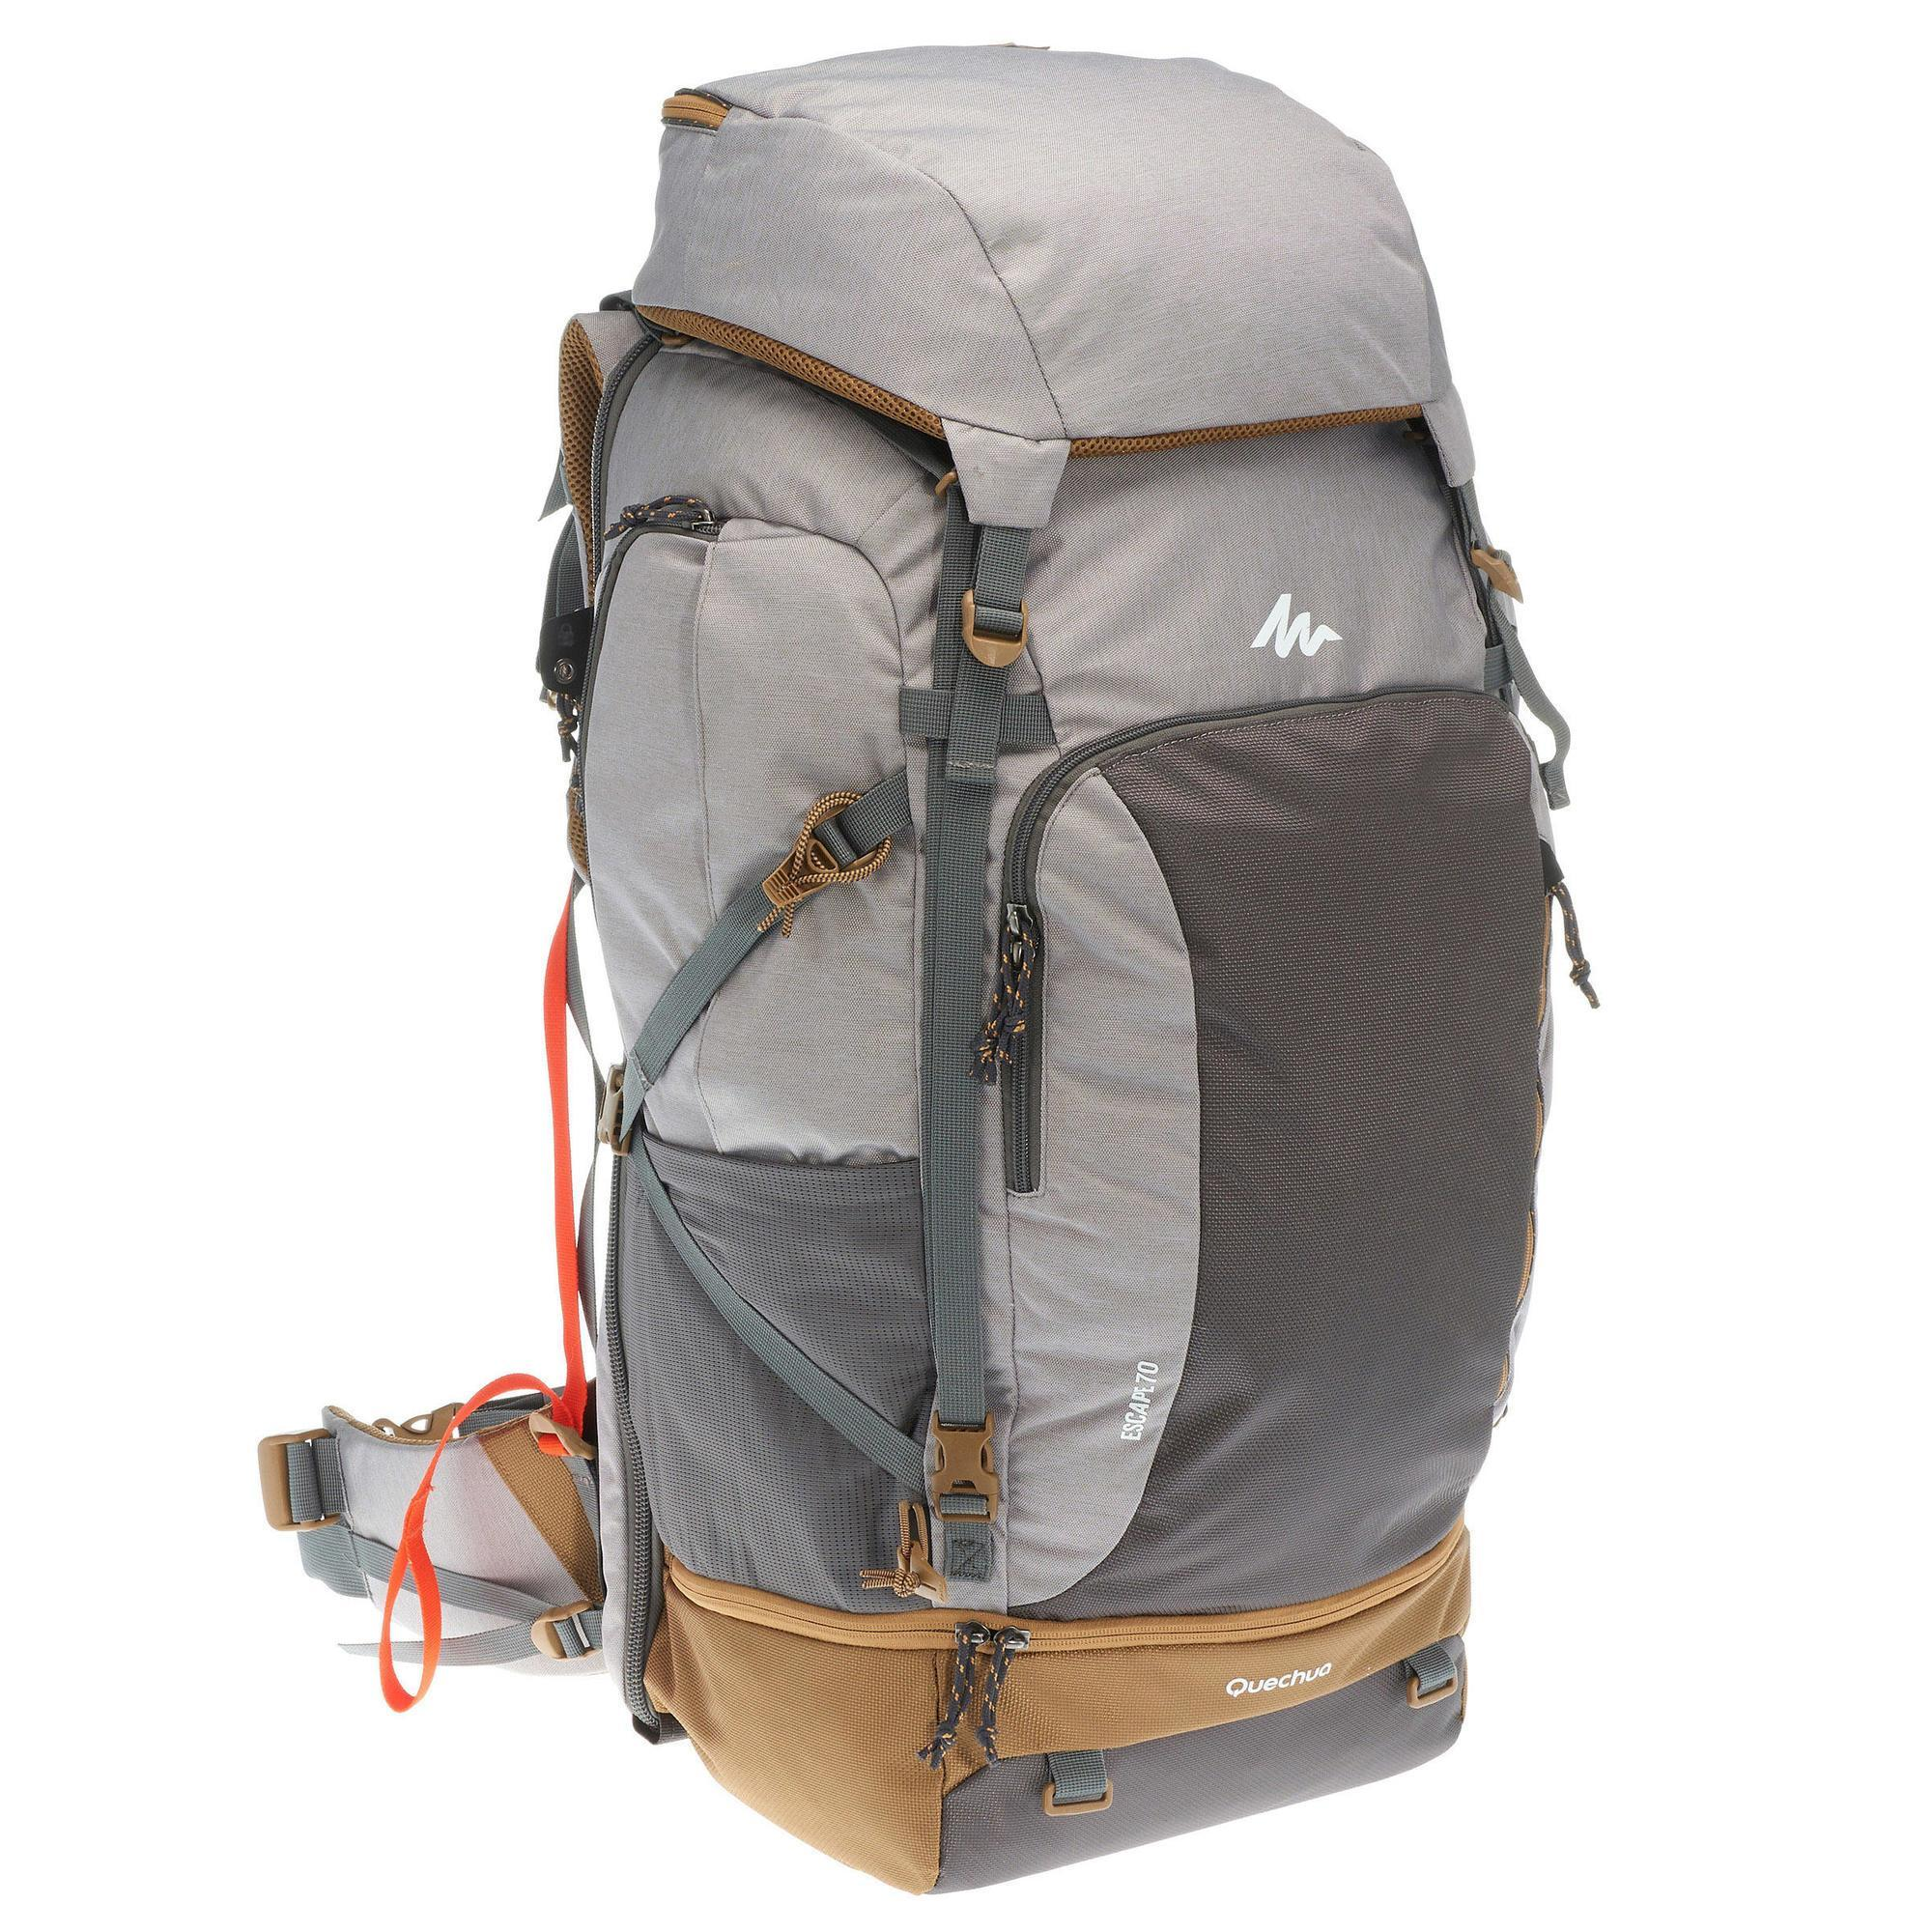 31d100279 Mochila de Montaña y Trekking Forclaz Travel500 70 Litros Mujer Gris Forclaz